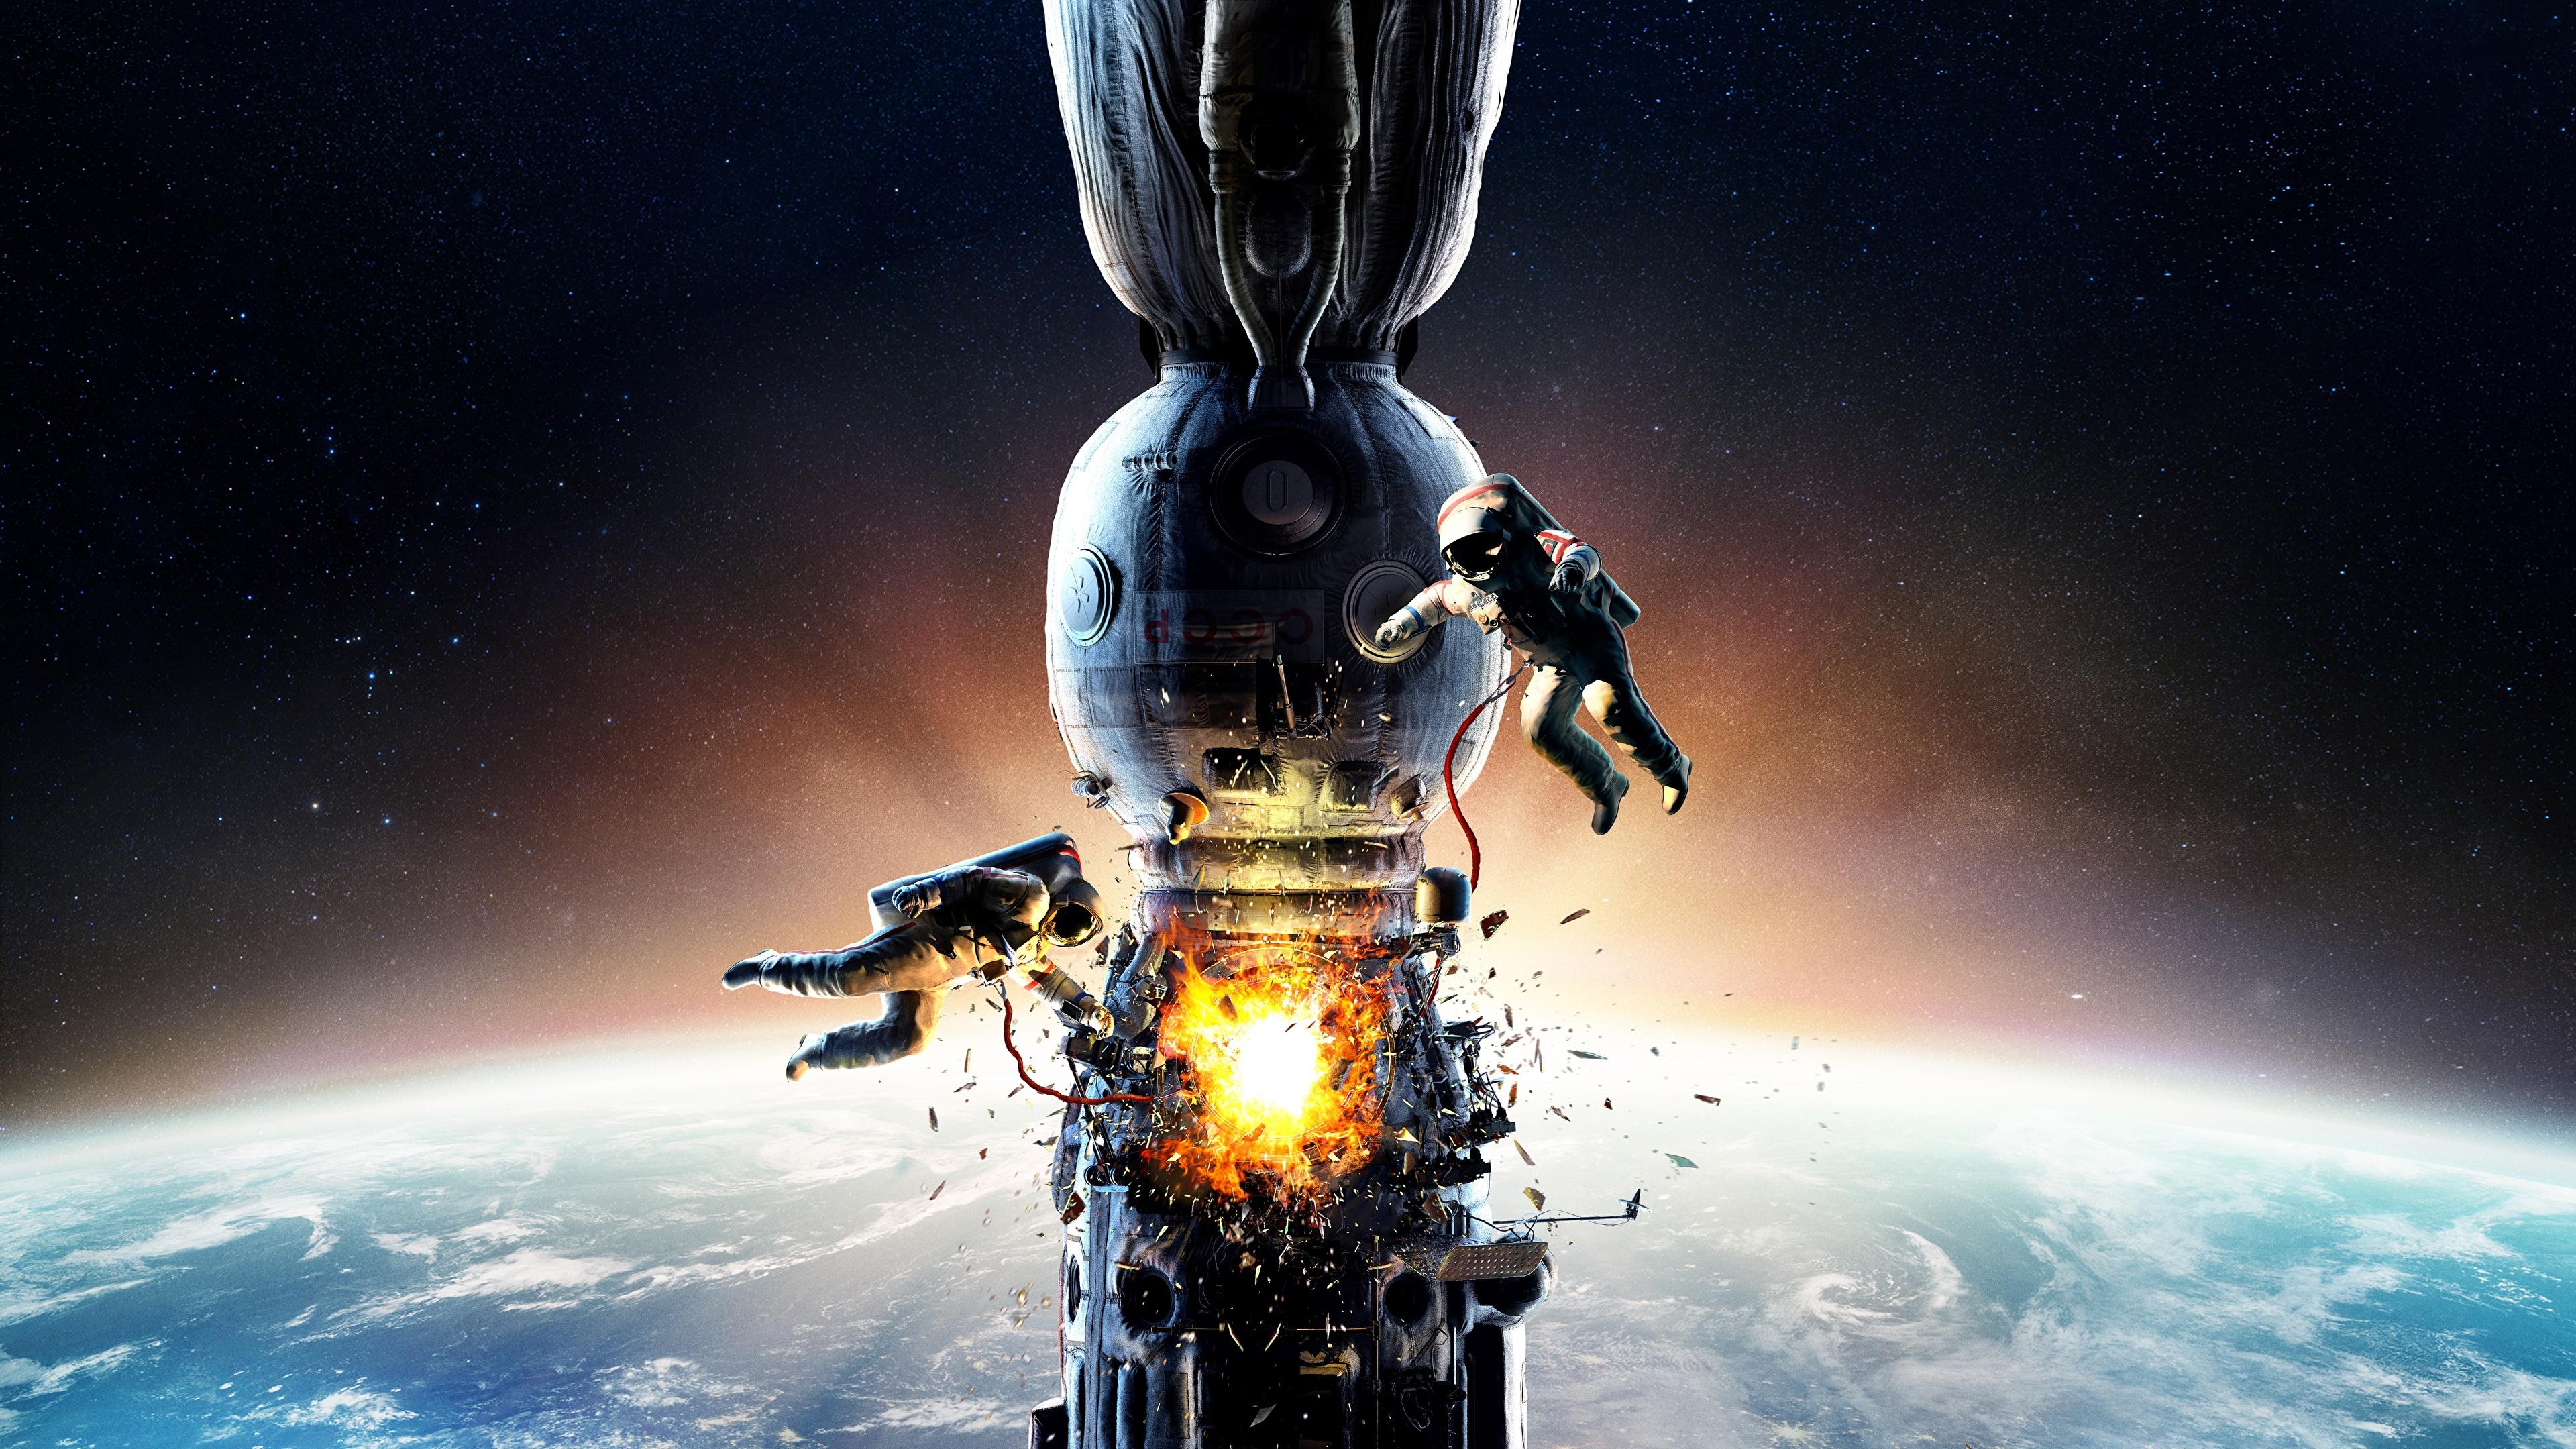 Achtergronden Explosie astronaut Ruimtestation Salyut-7 Ruimte Films 3840x2160 Ruimtevaarder film